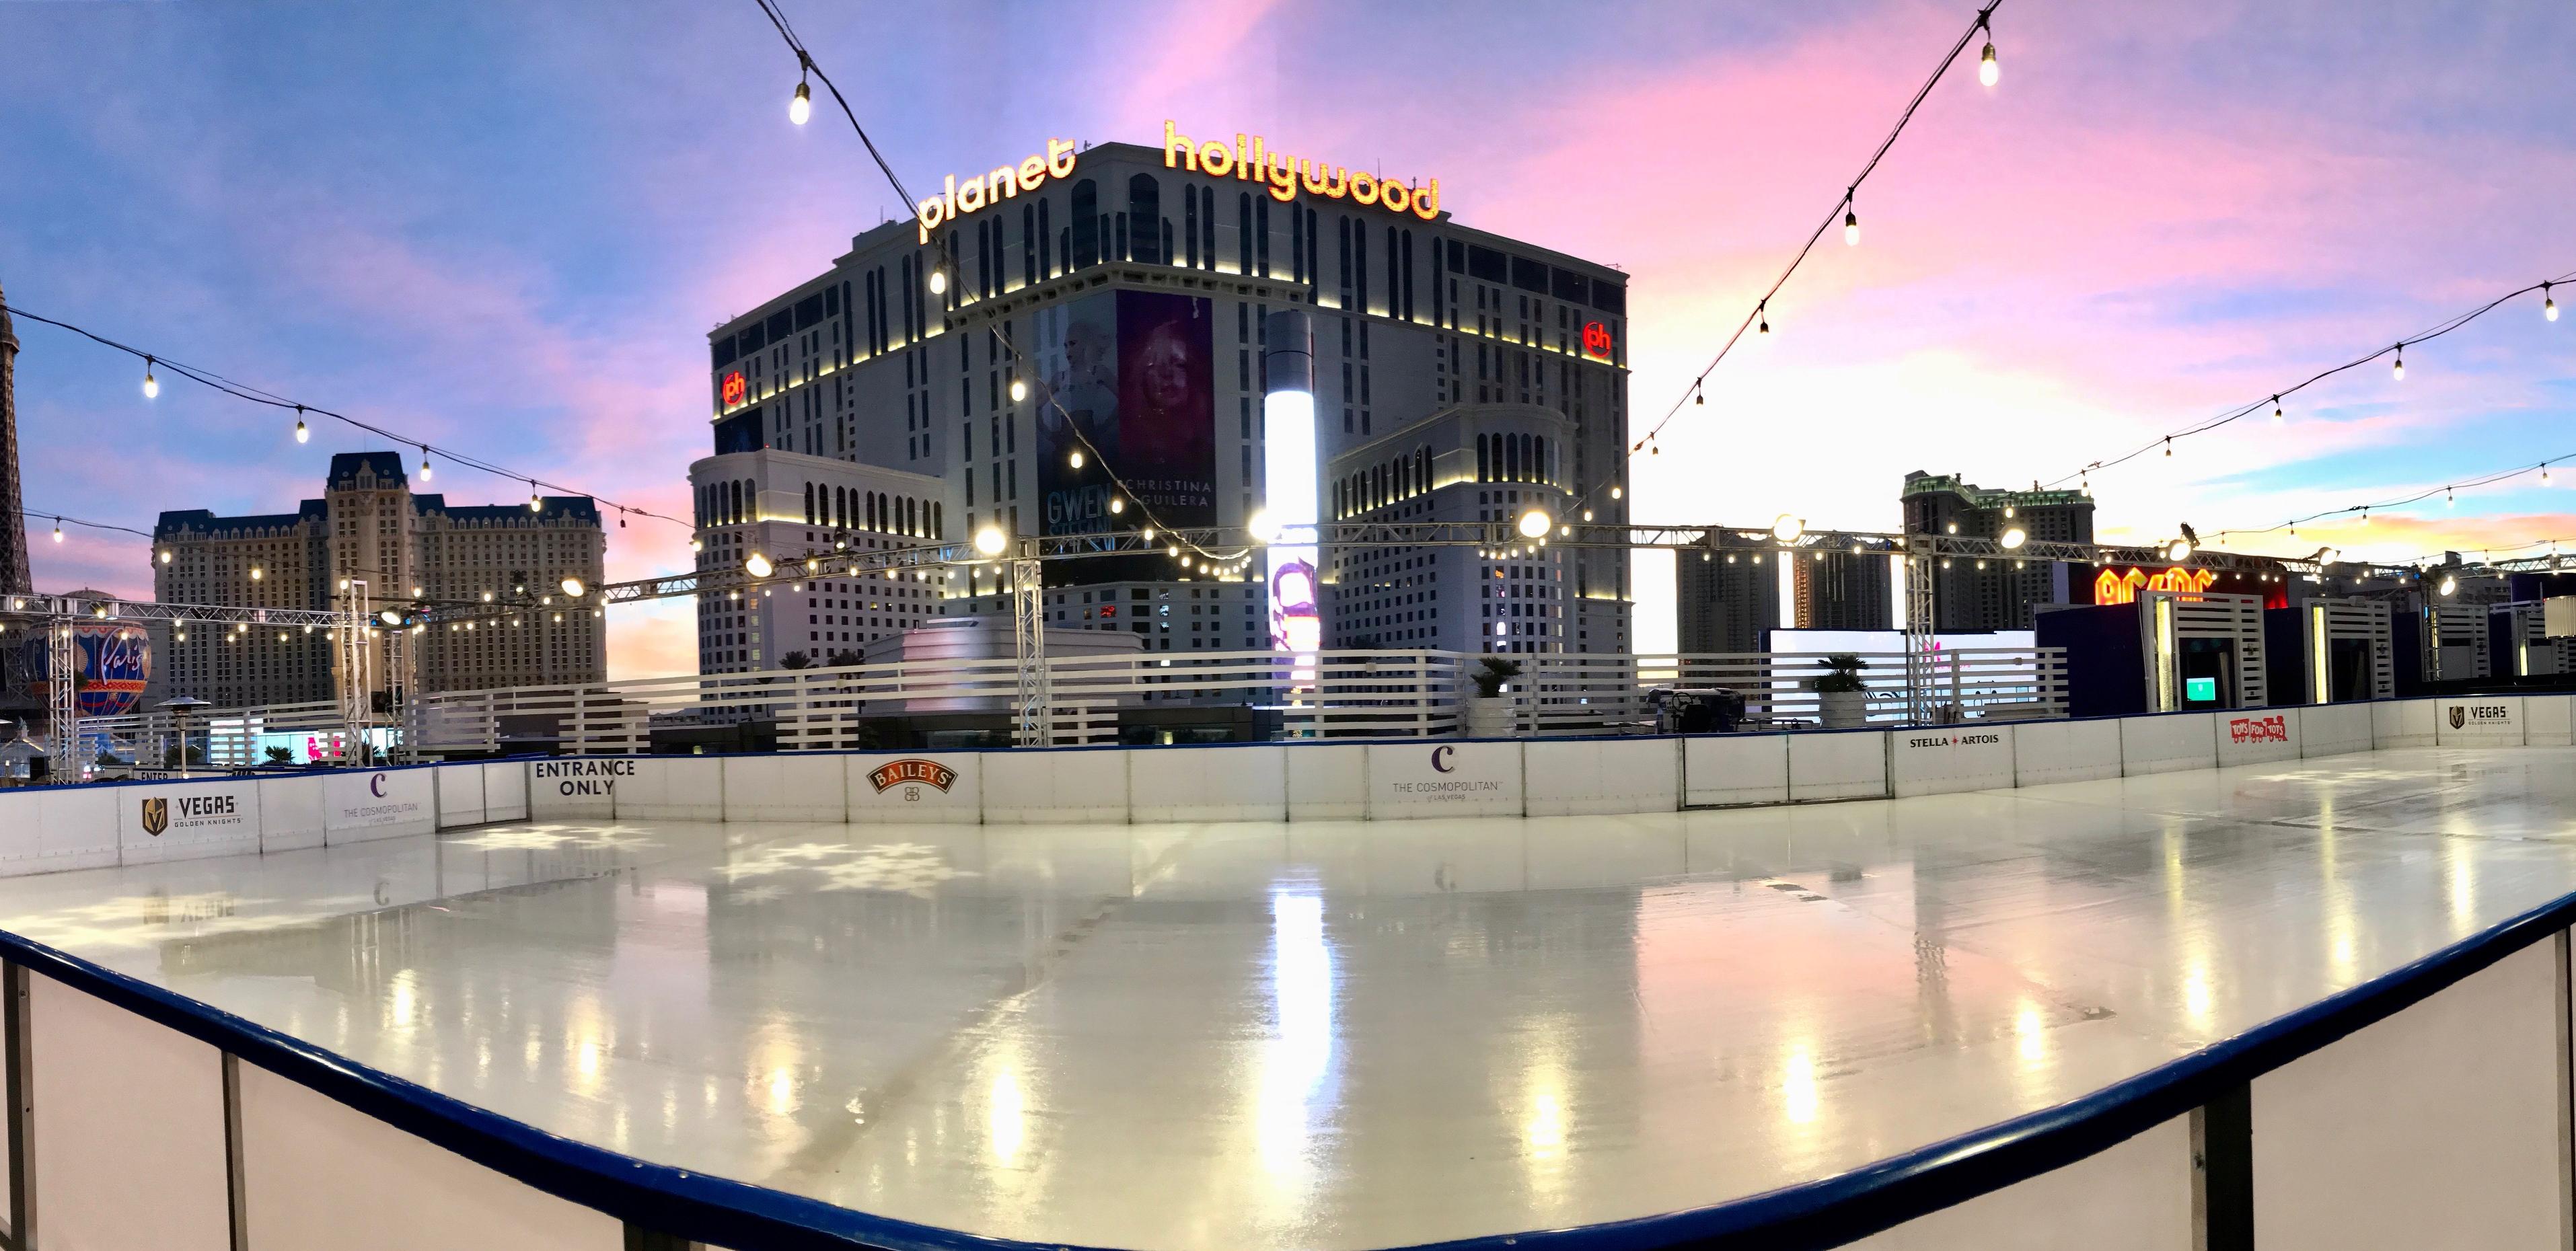 Ice Skating Anyone Holiday Tradition Returns To Las Vegas Strip Klas